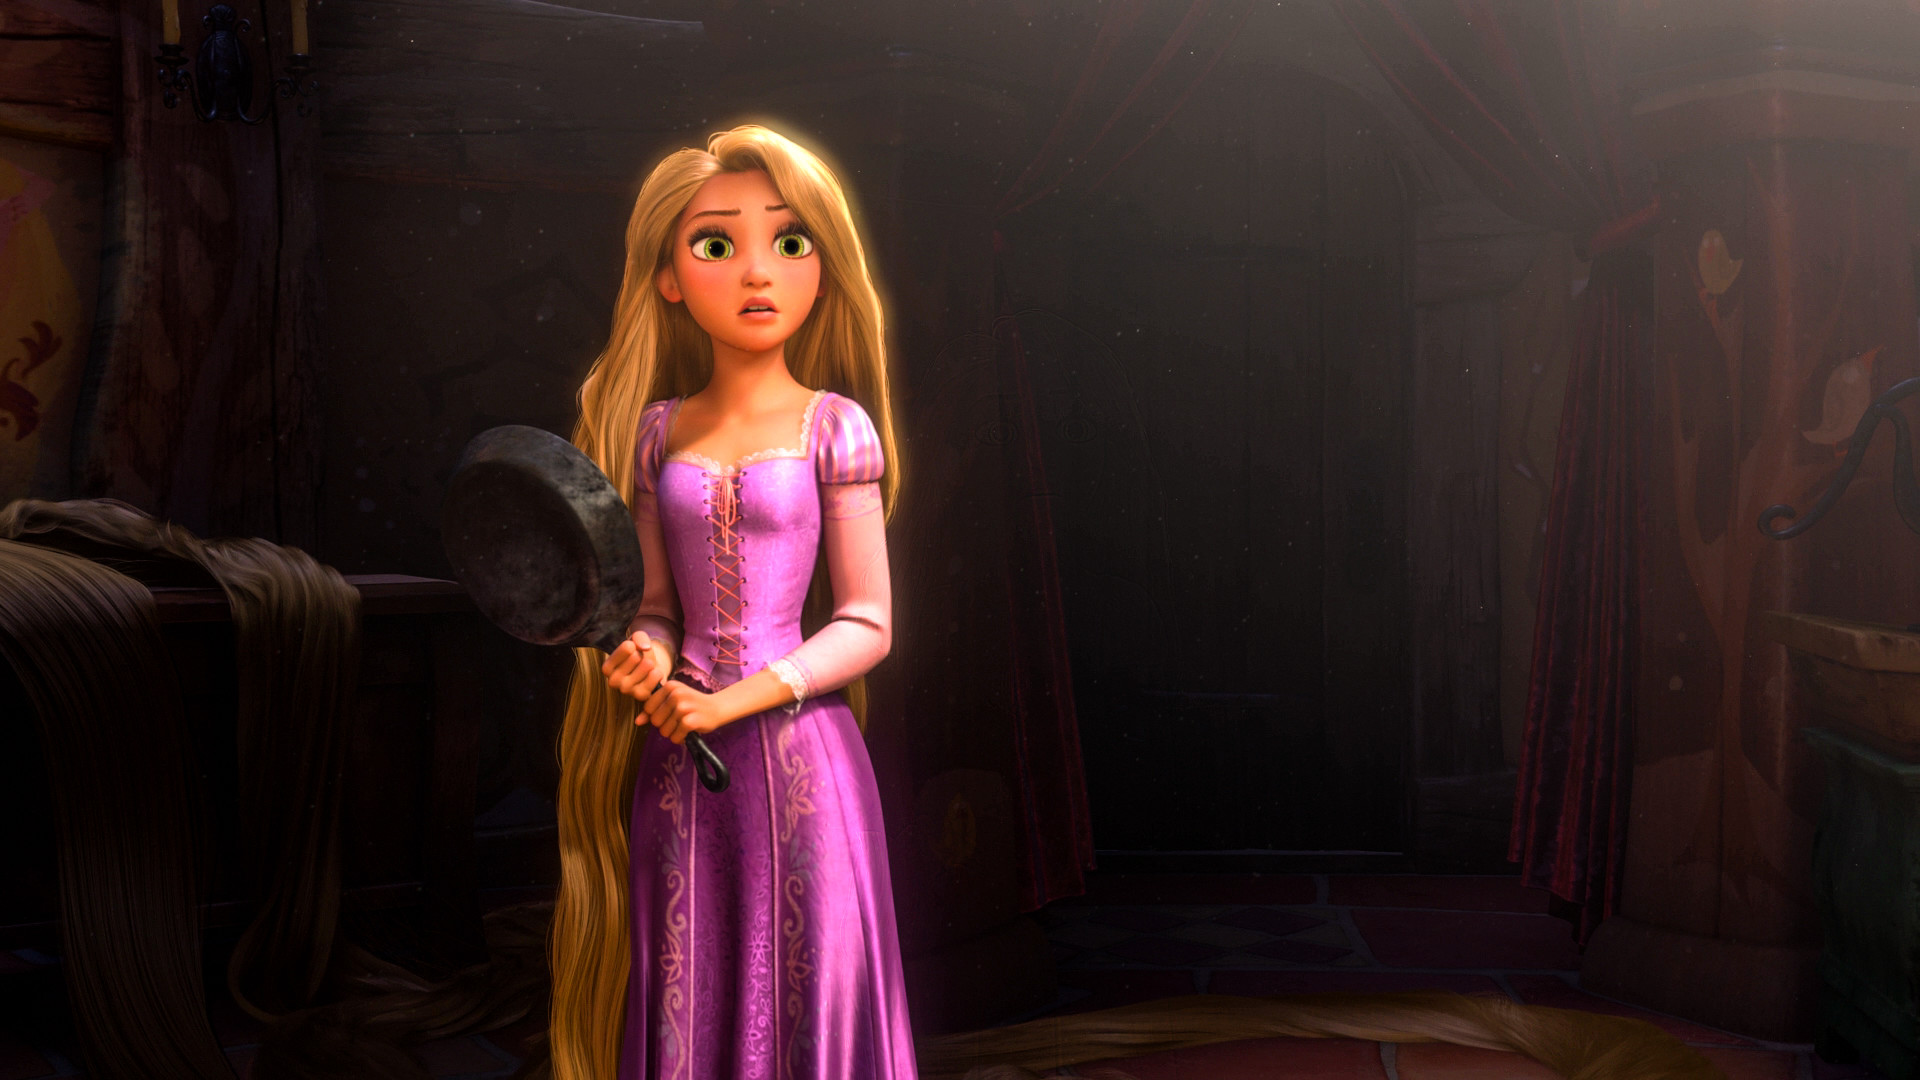 Rapunzel wallpaper 66 pictures - Rapunzel pictures download ...